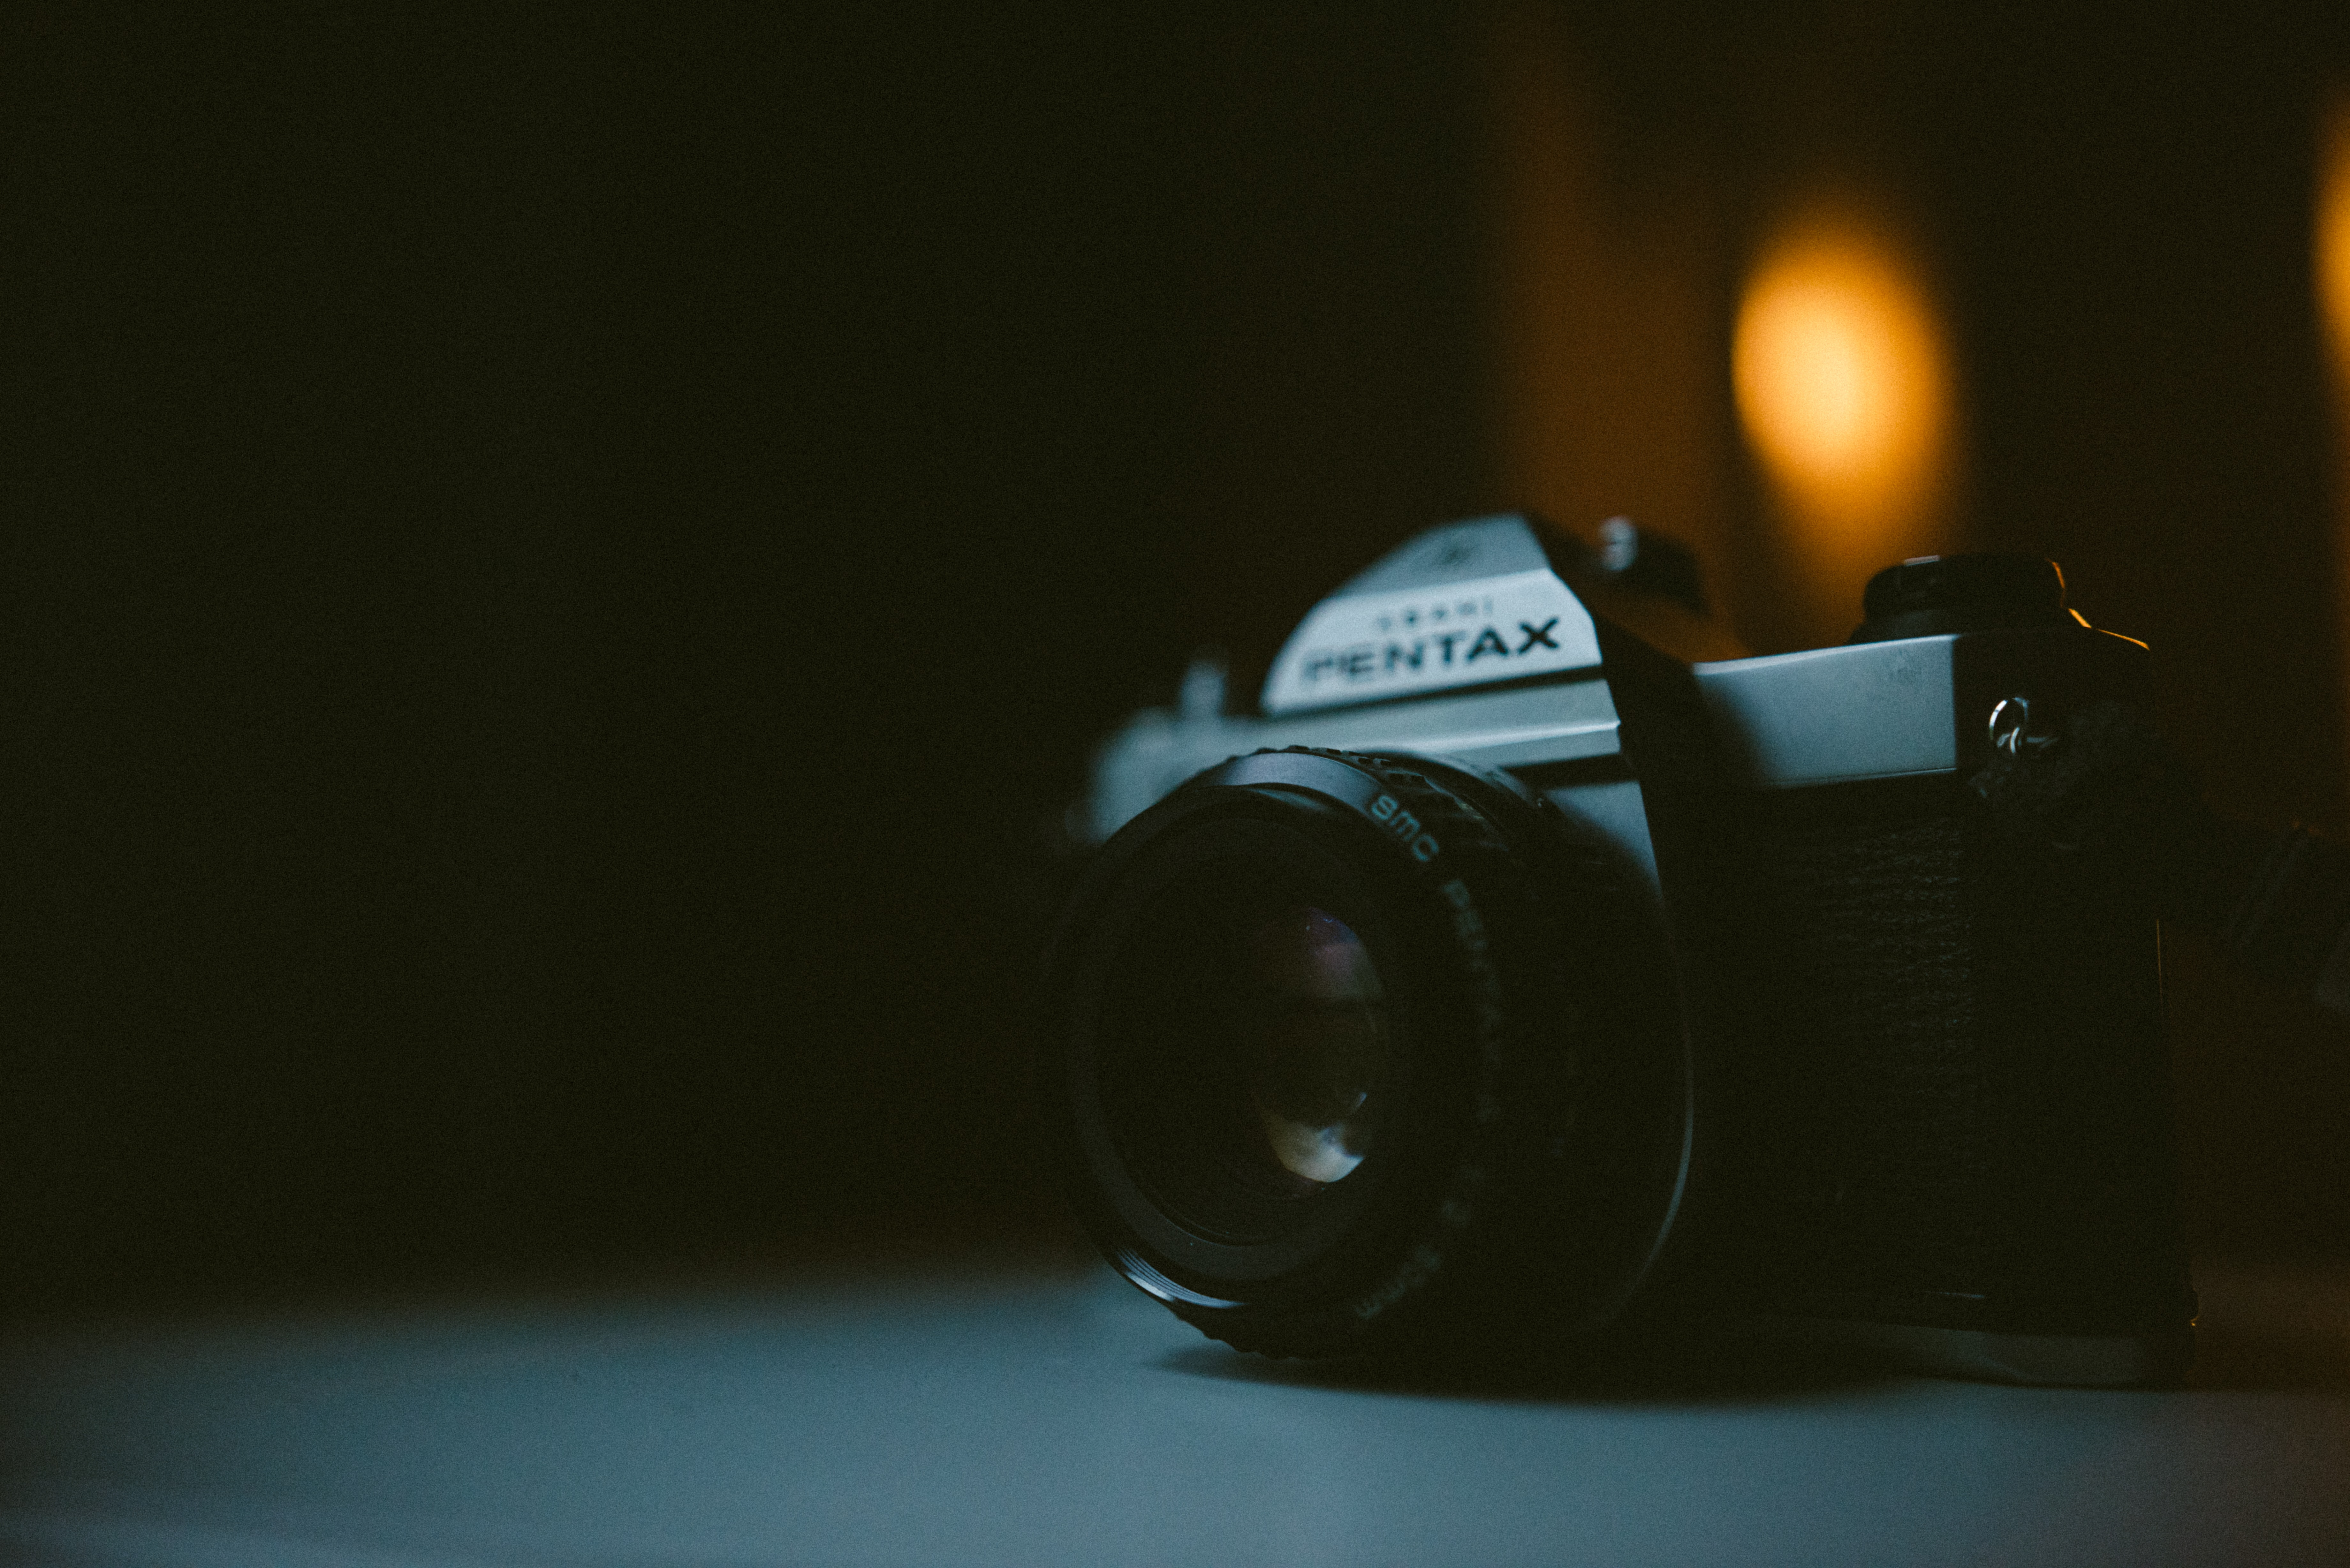 silver Pentax DSLR camera